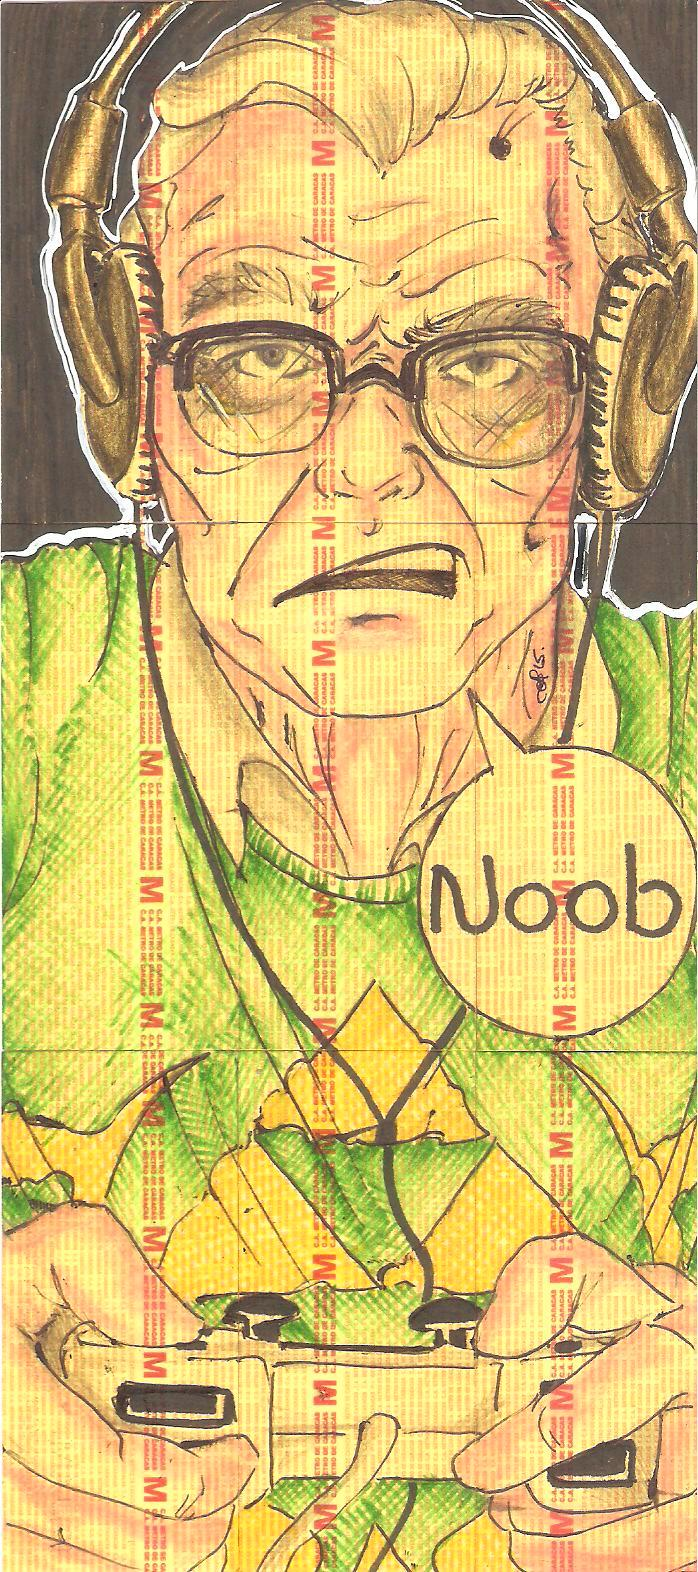 Noob by Kary-Kary